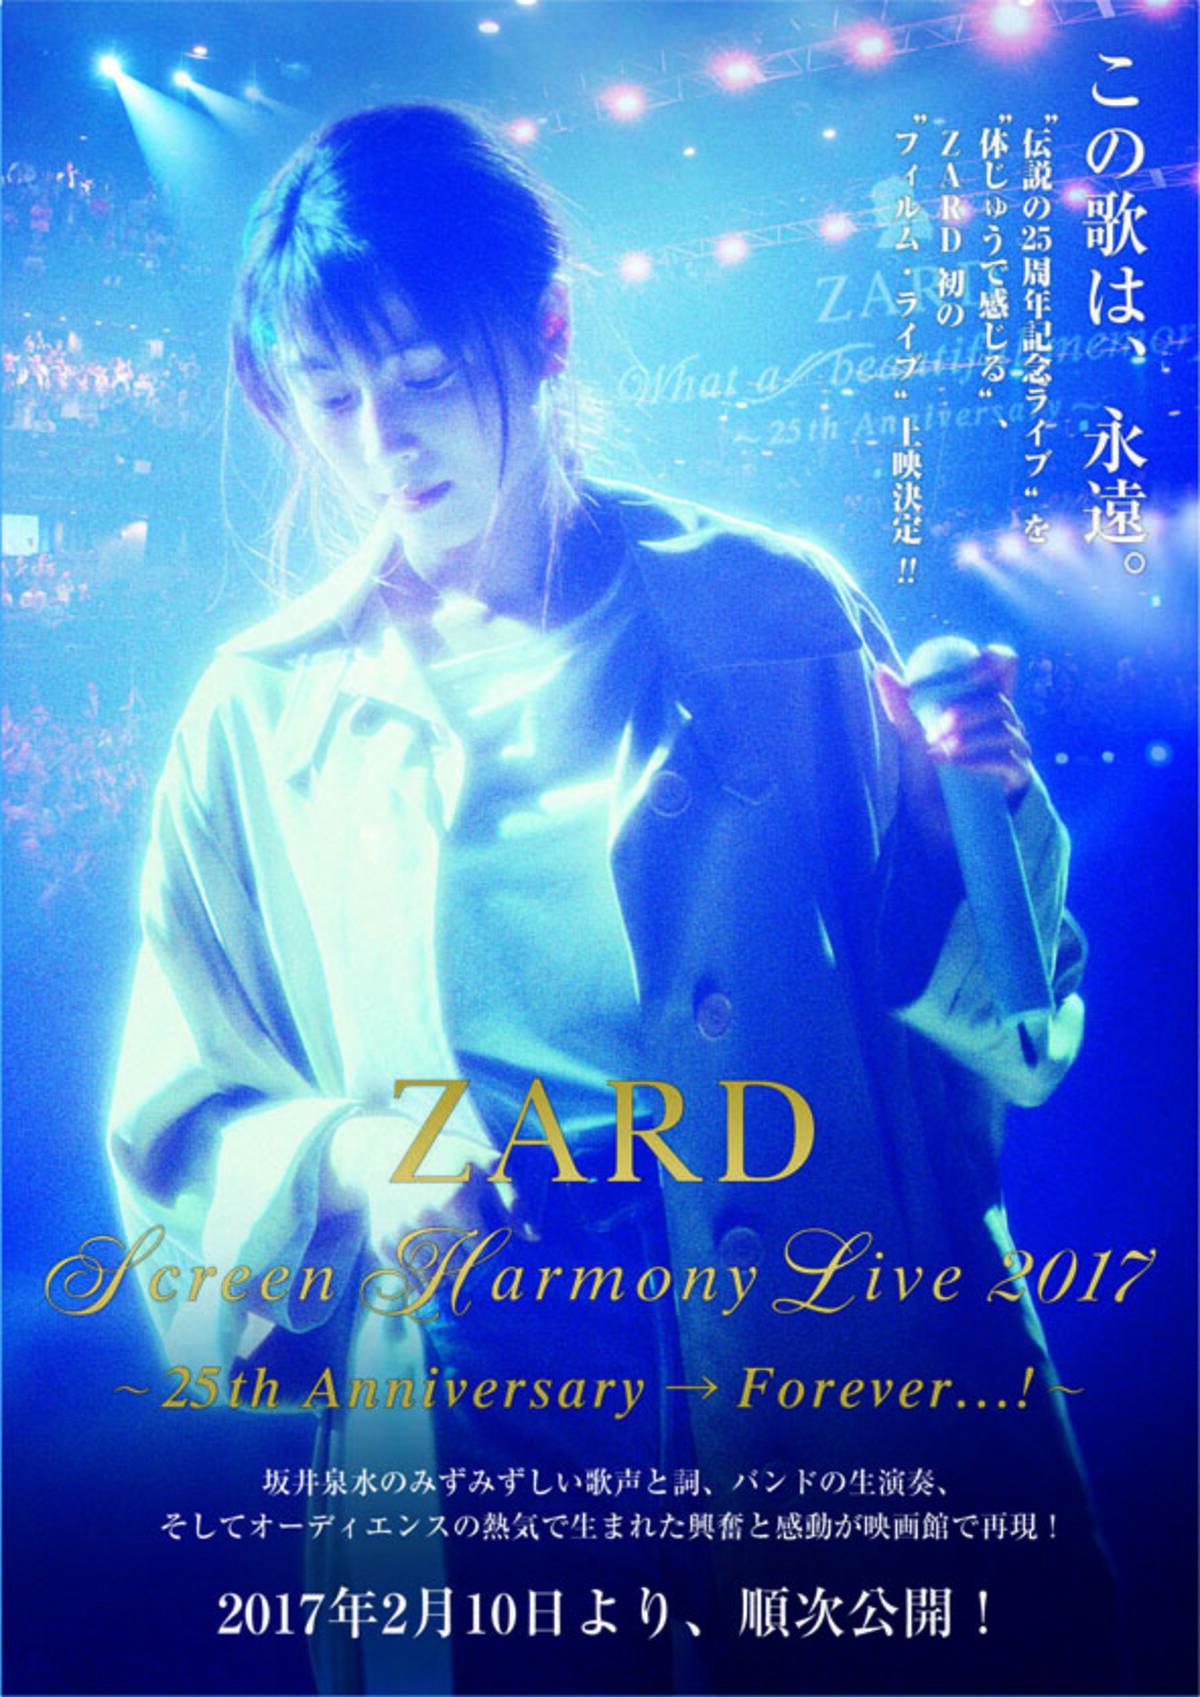 Zardのデビュー26周年を記念したフィルムライブの開催が決定 17年2月4日 エキサイトニュース